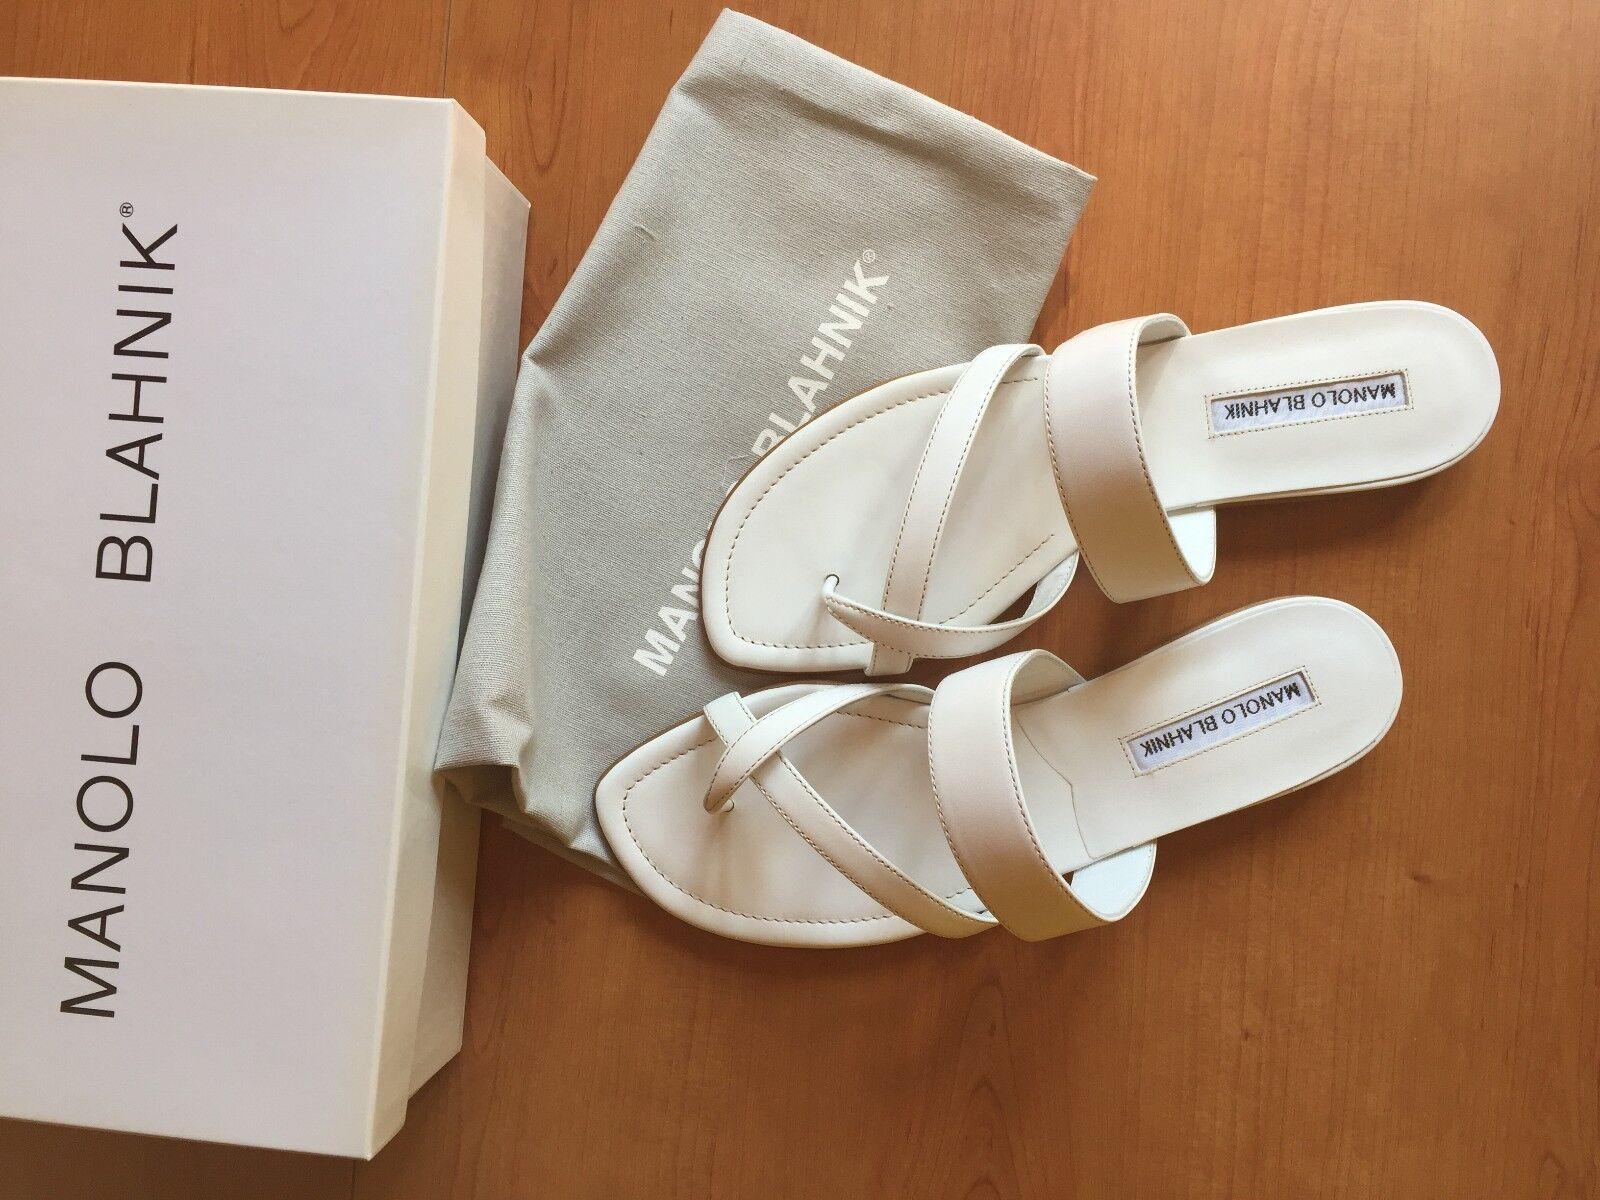 Manolo blahnik sandalias tira dedo flip flop Susa OVP dustbag